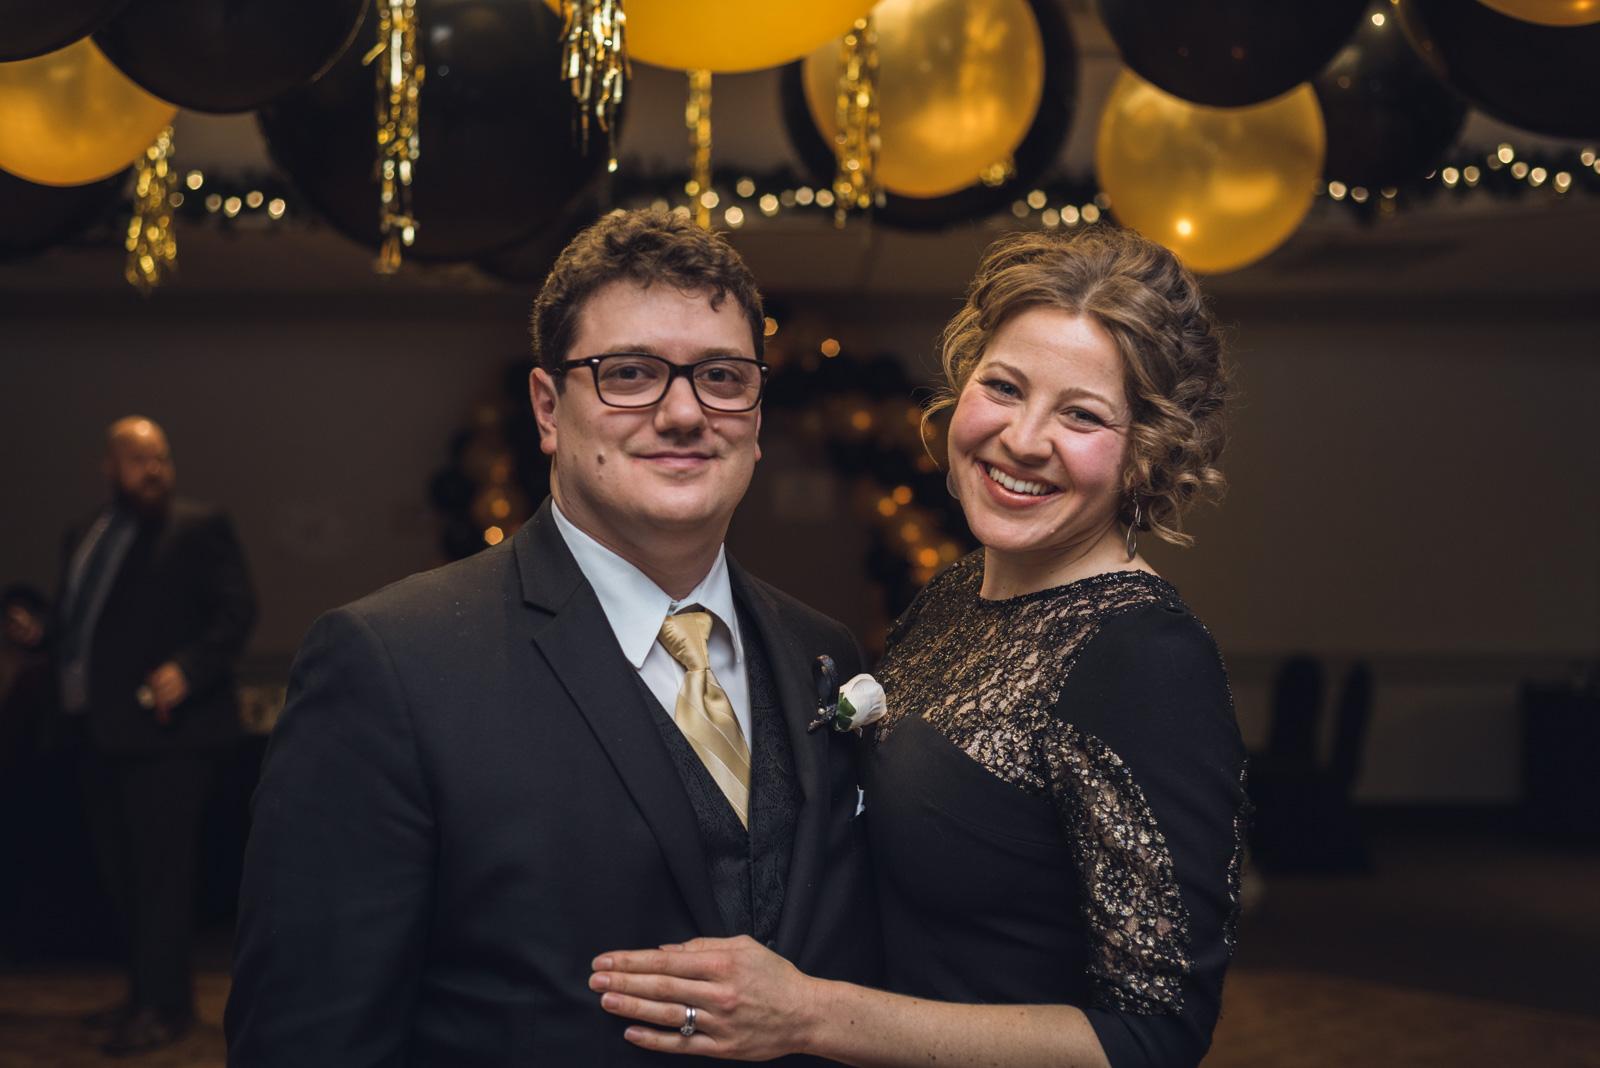 rheana-chris-wedding-blog-242.jpg